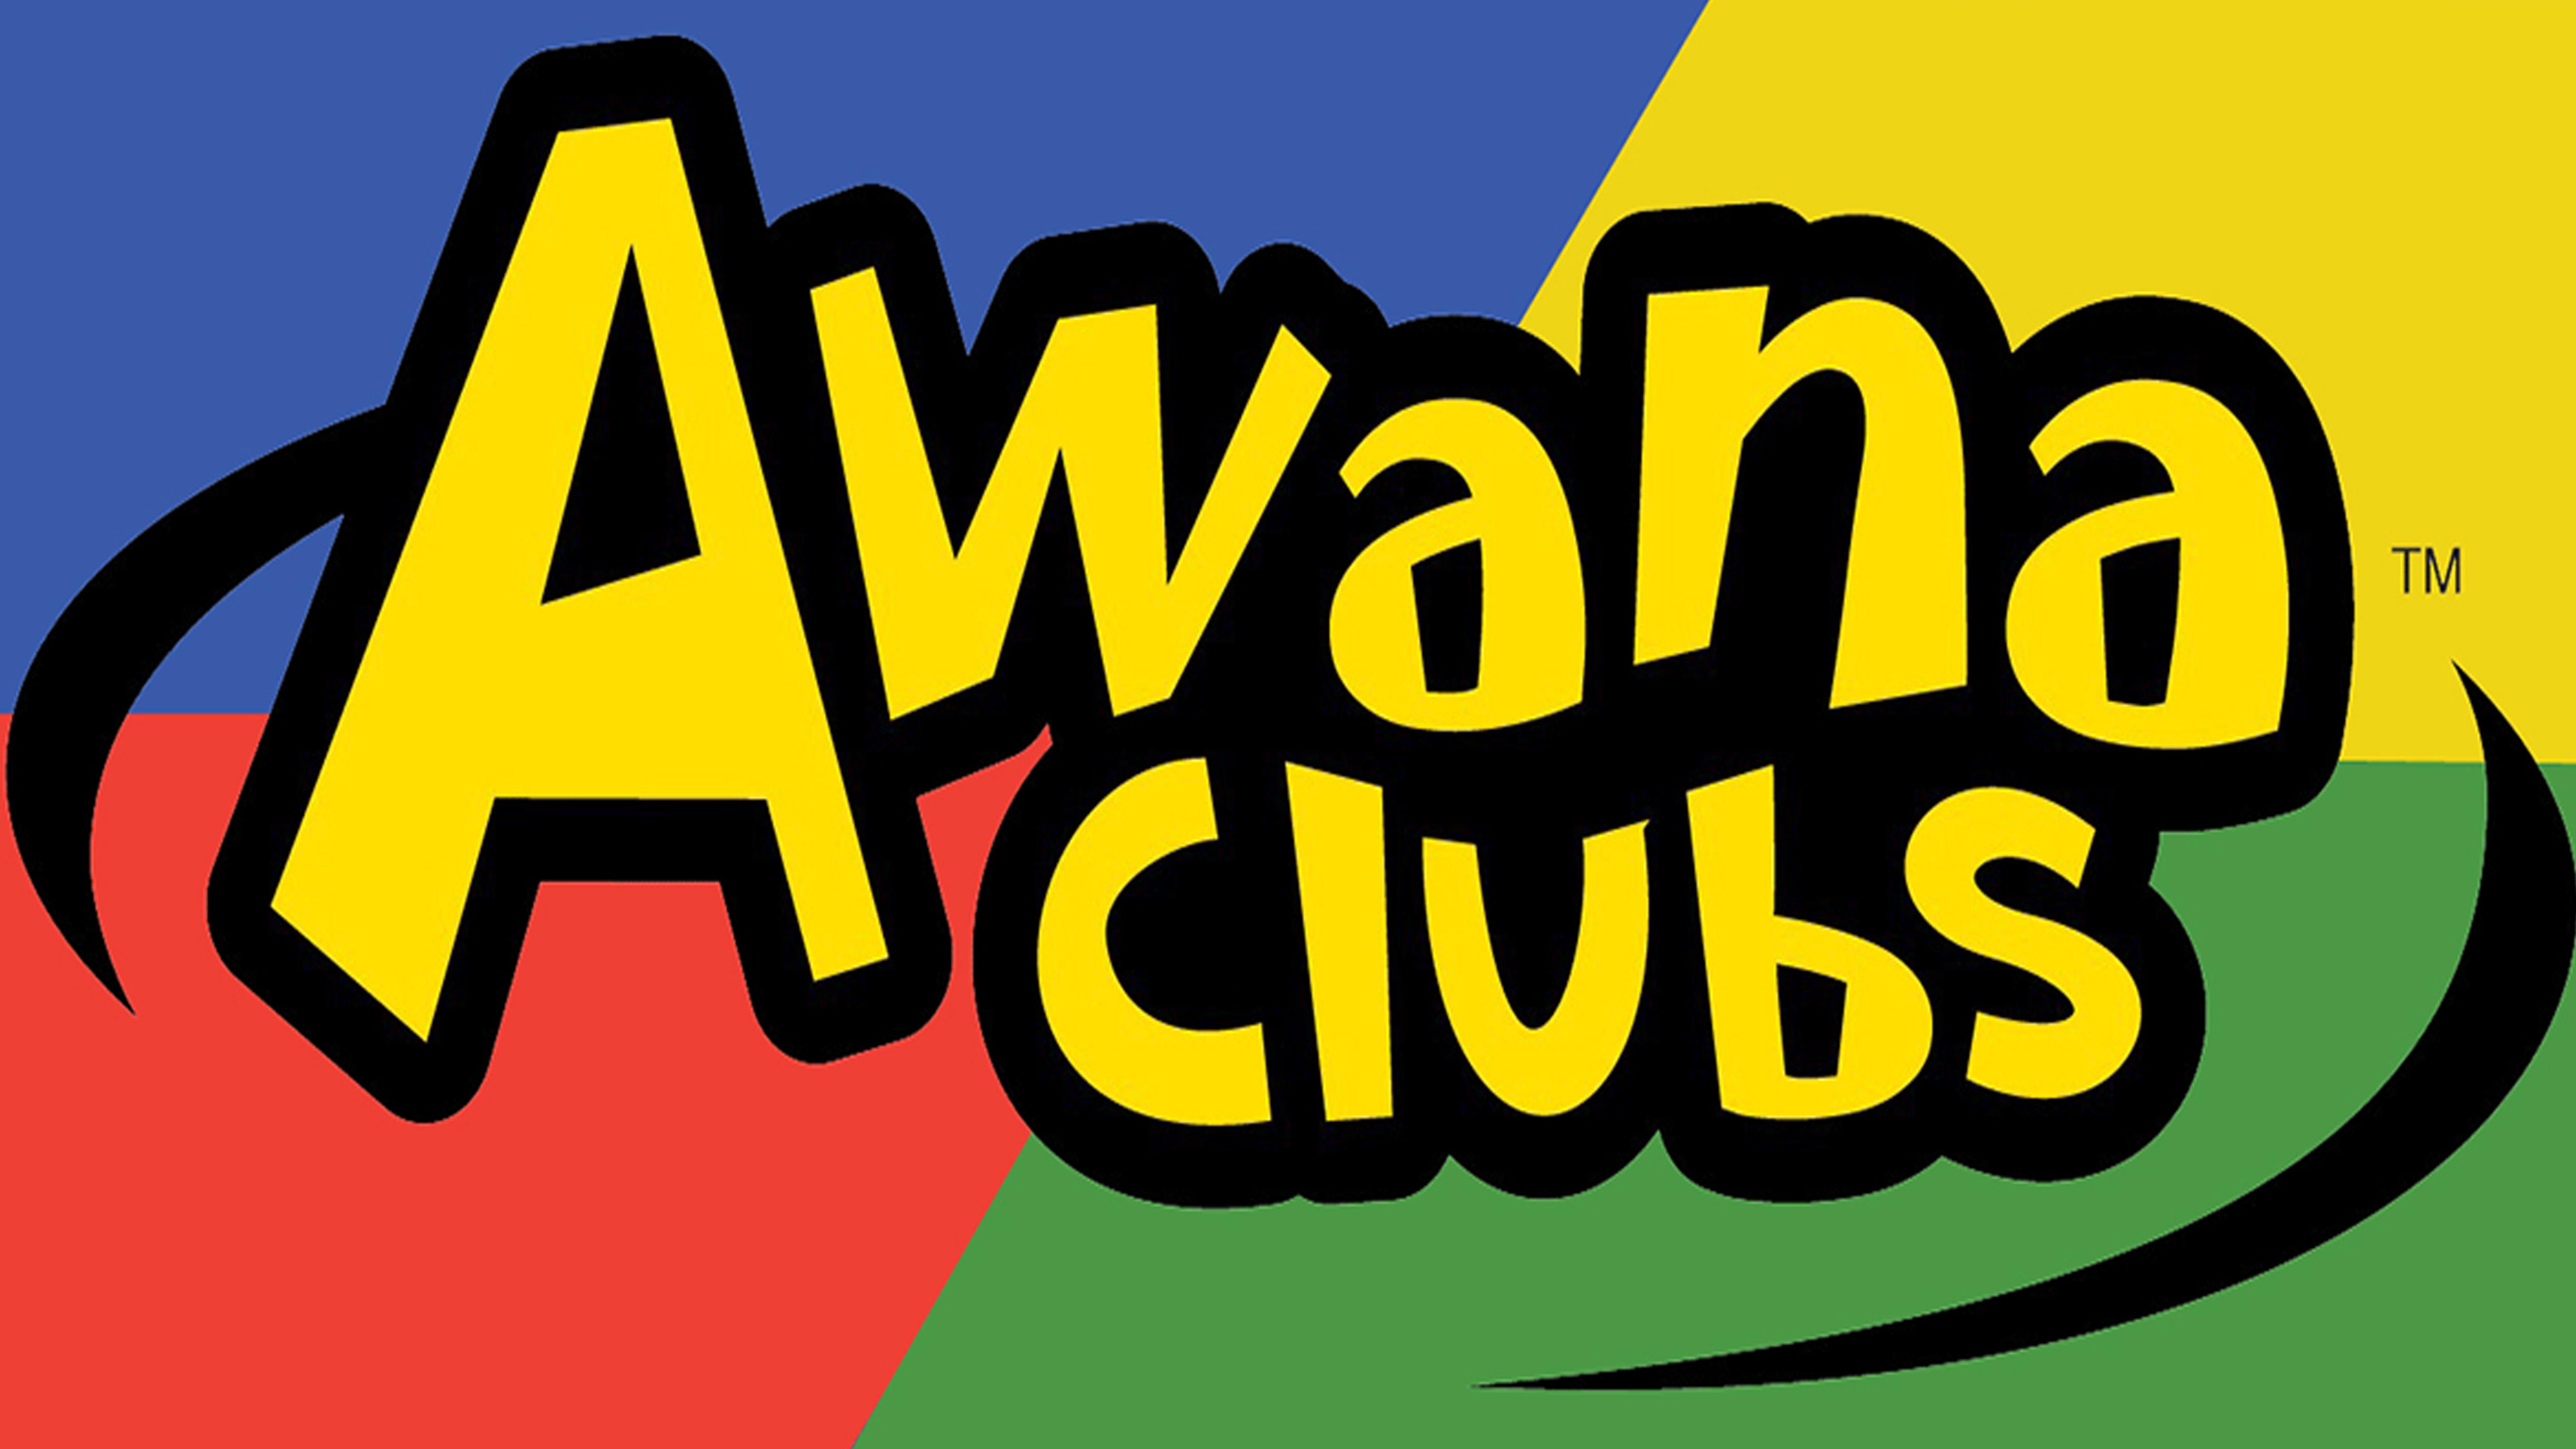 Awana clipart club awana. Clubs gateway baptist church